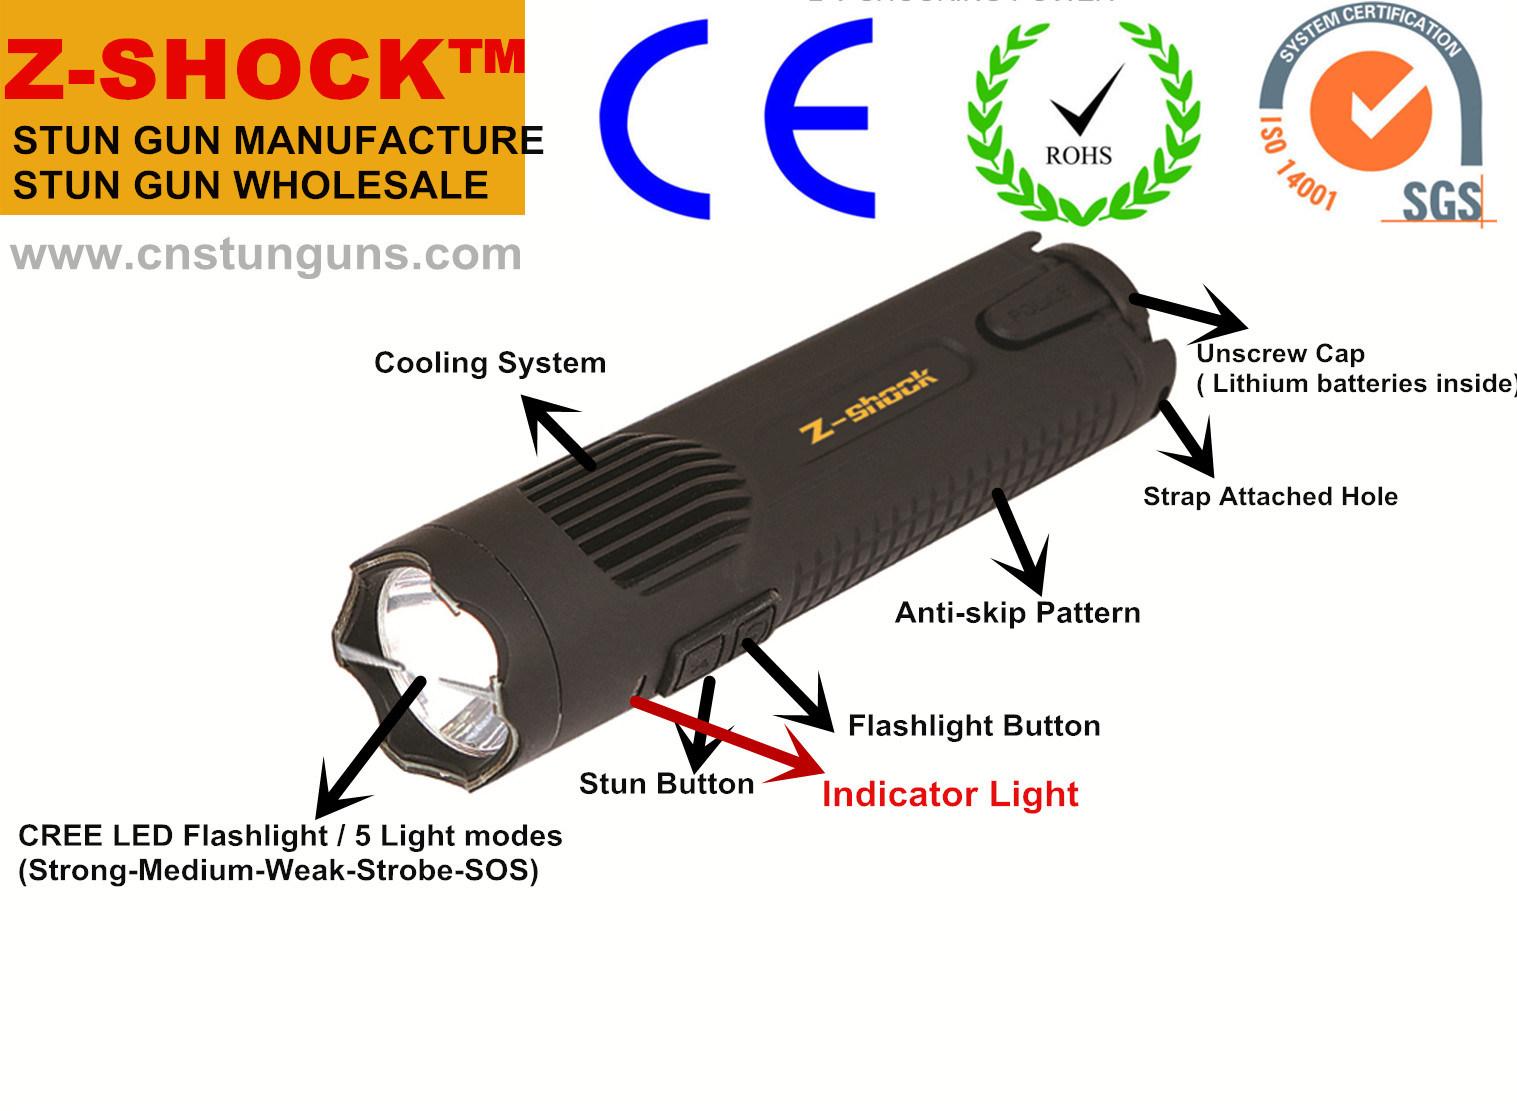 LED Flashlight Stun Gun (1101) Type for Self-Defense with RoHS